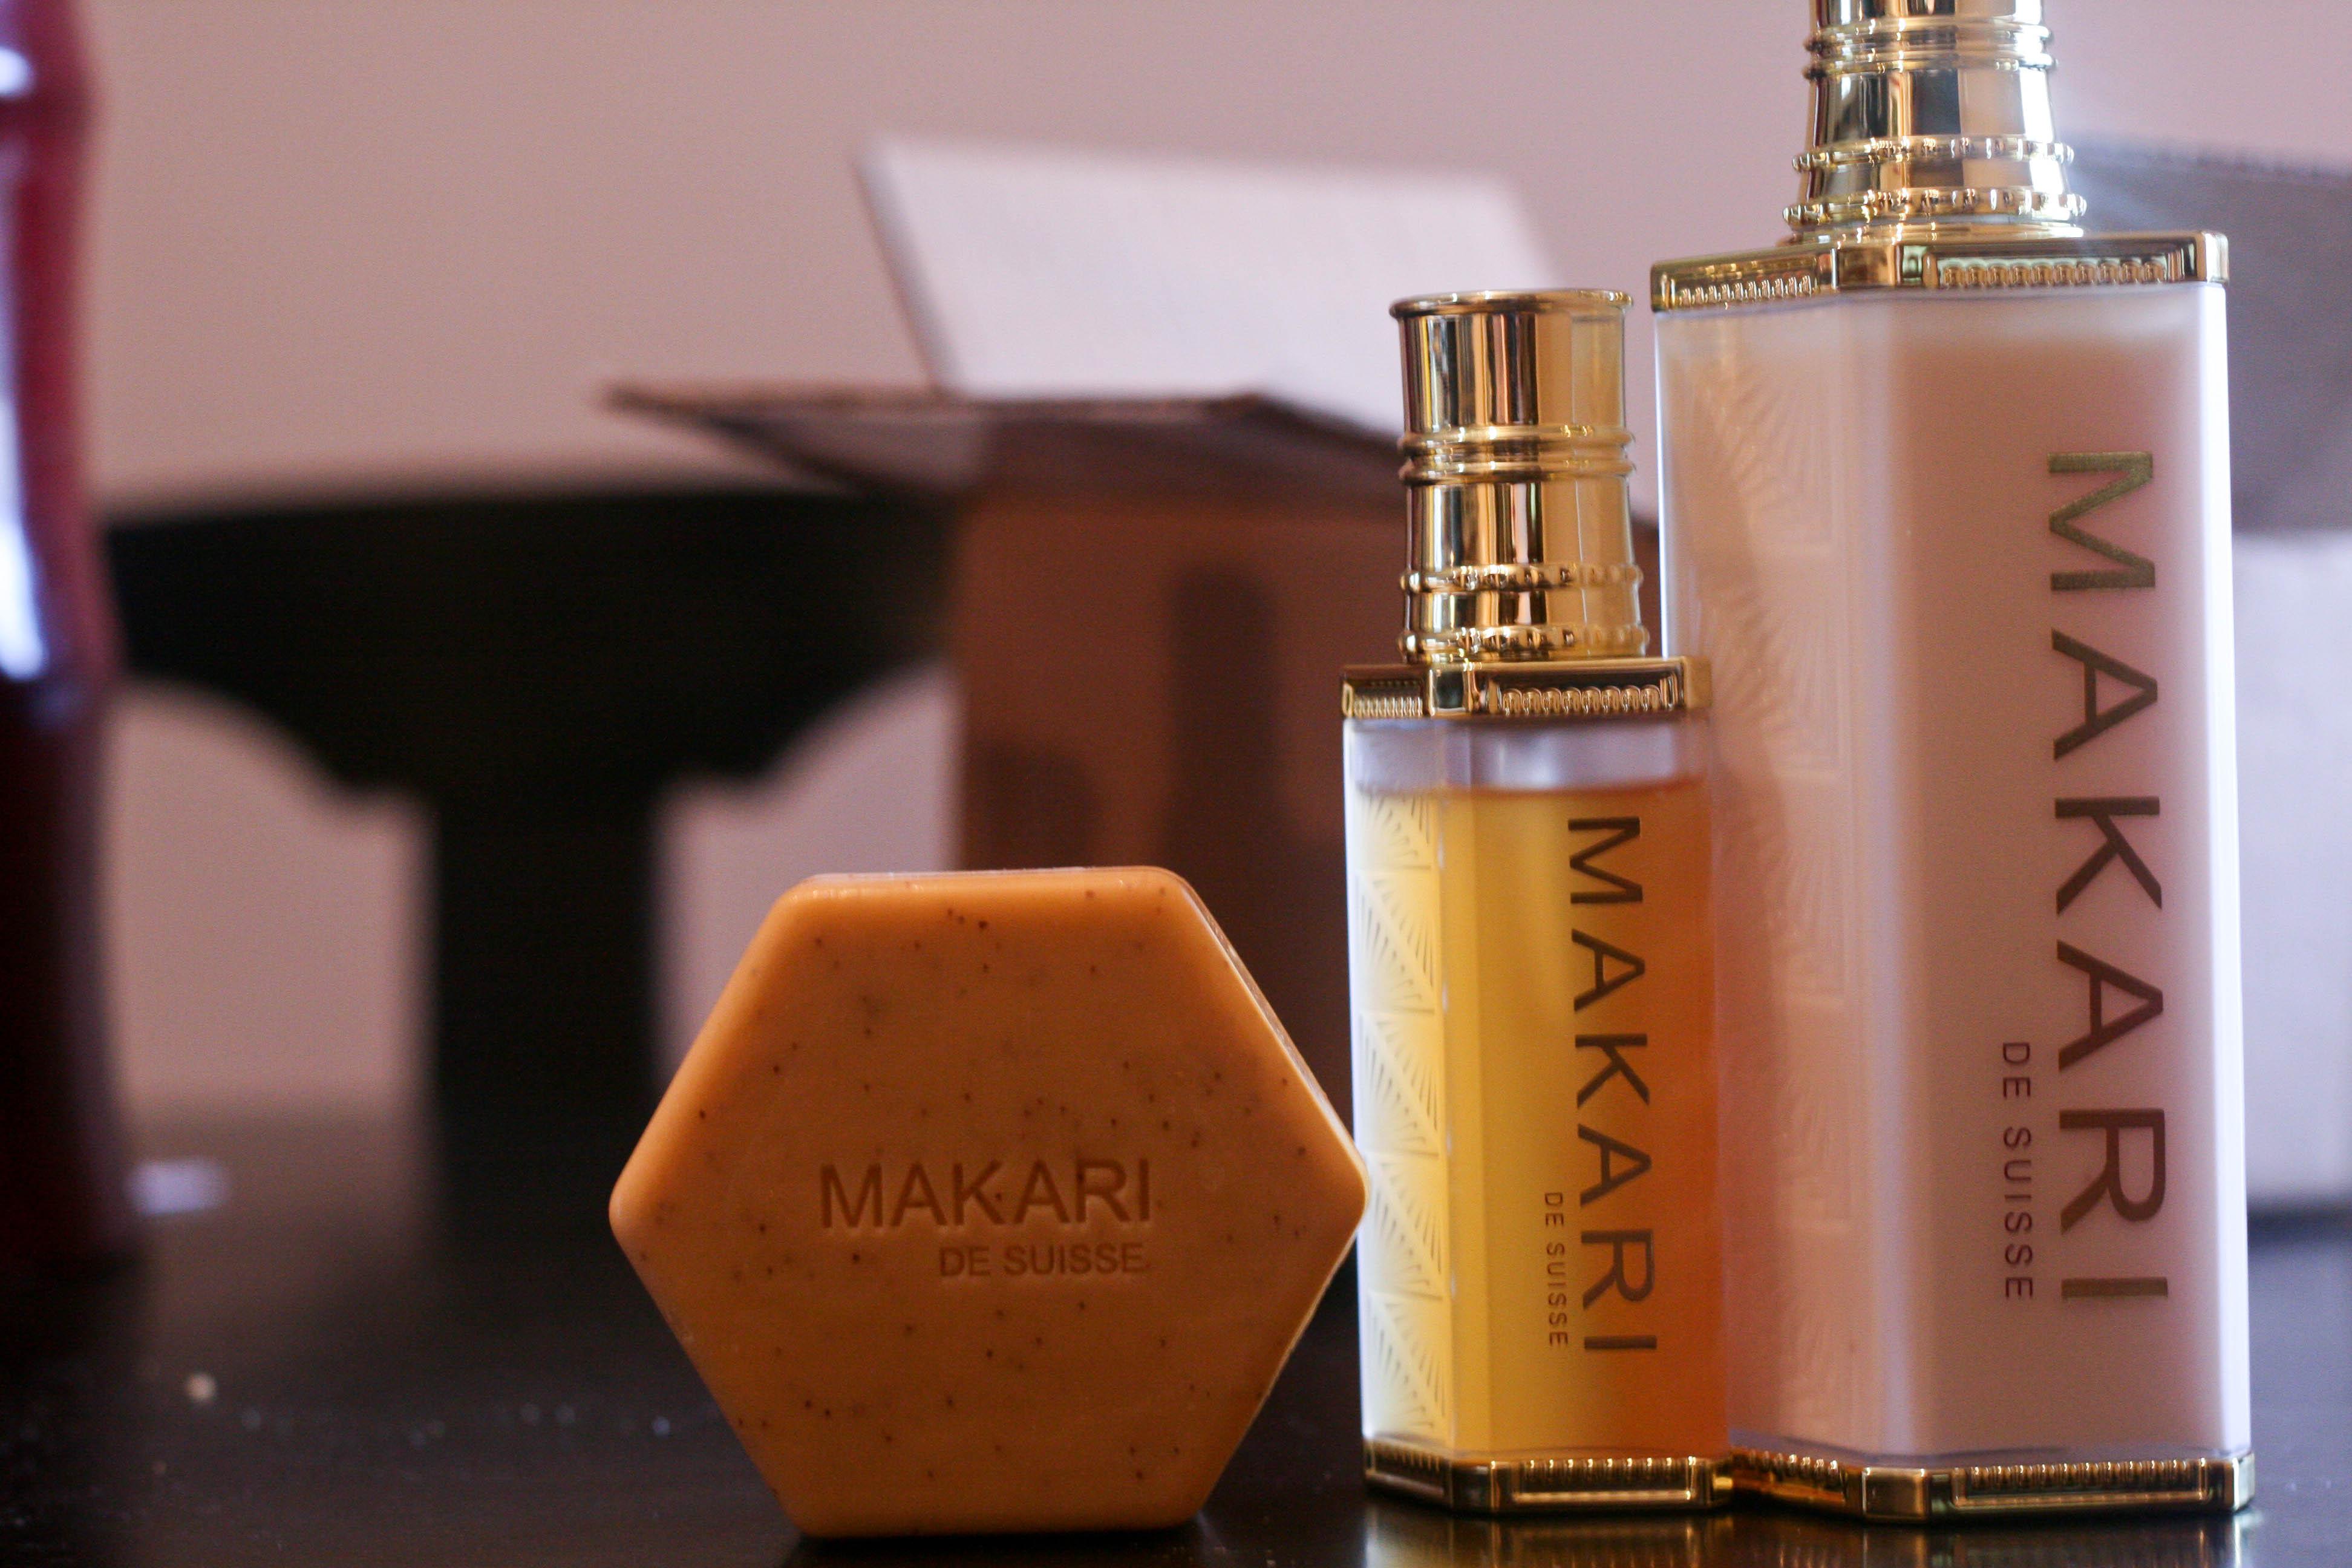 Macari products for dark skin